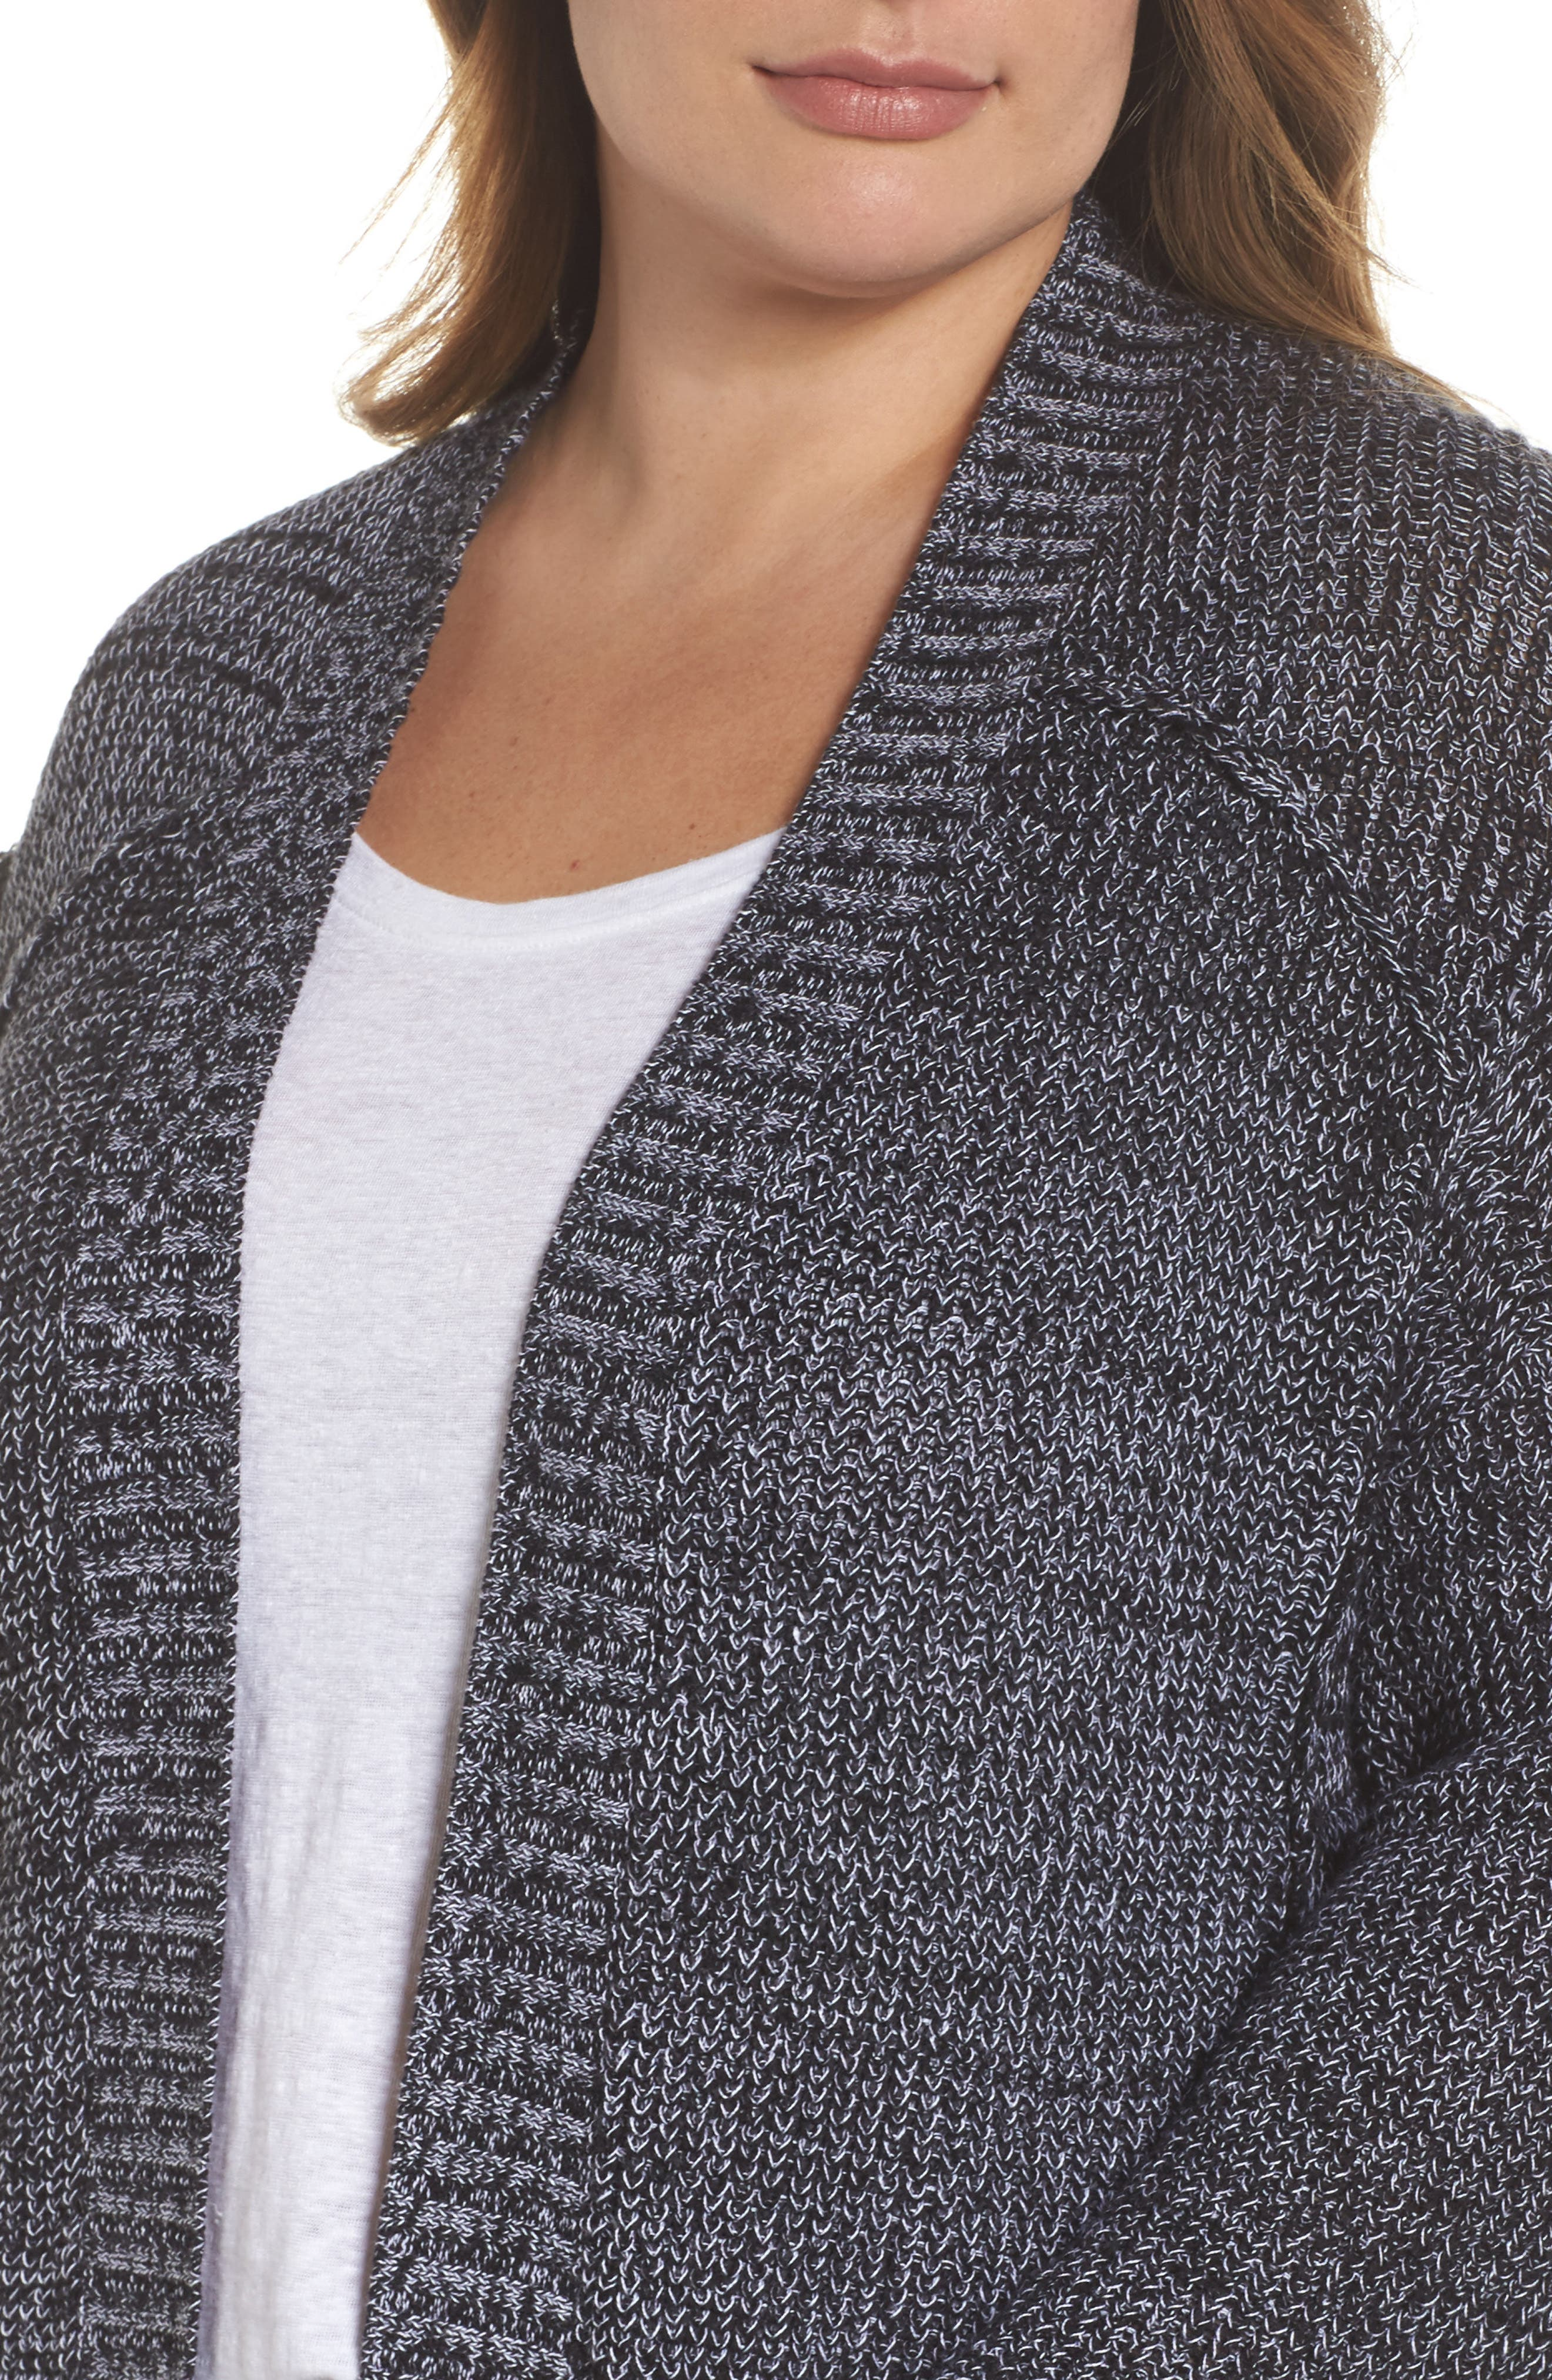 Sweater Knit Cardigan,                             Alternate thumbnail 4, color,                             001